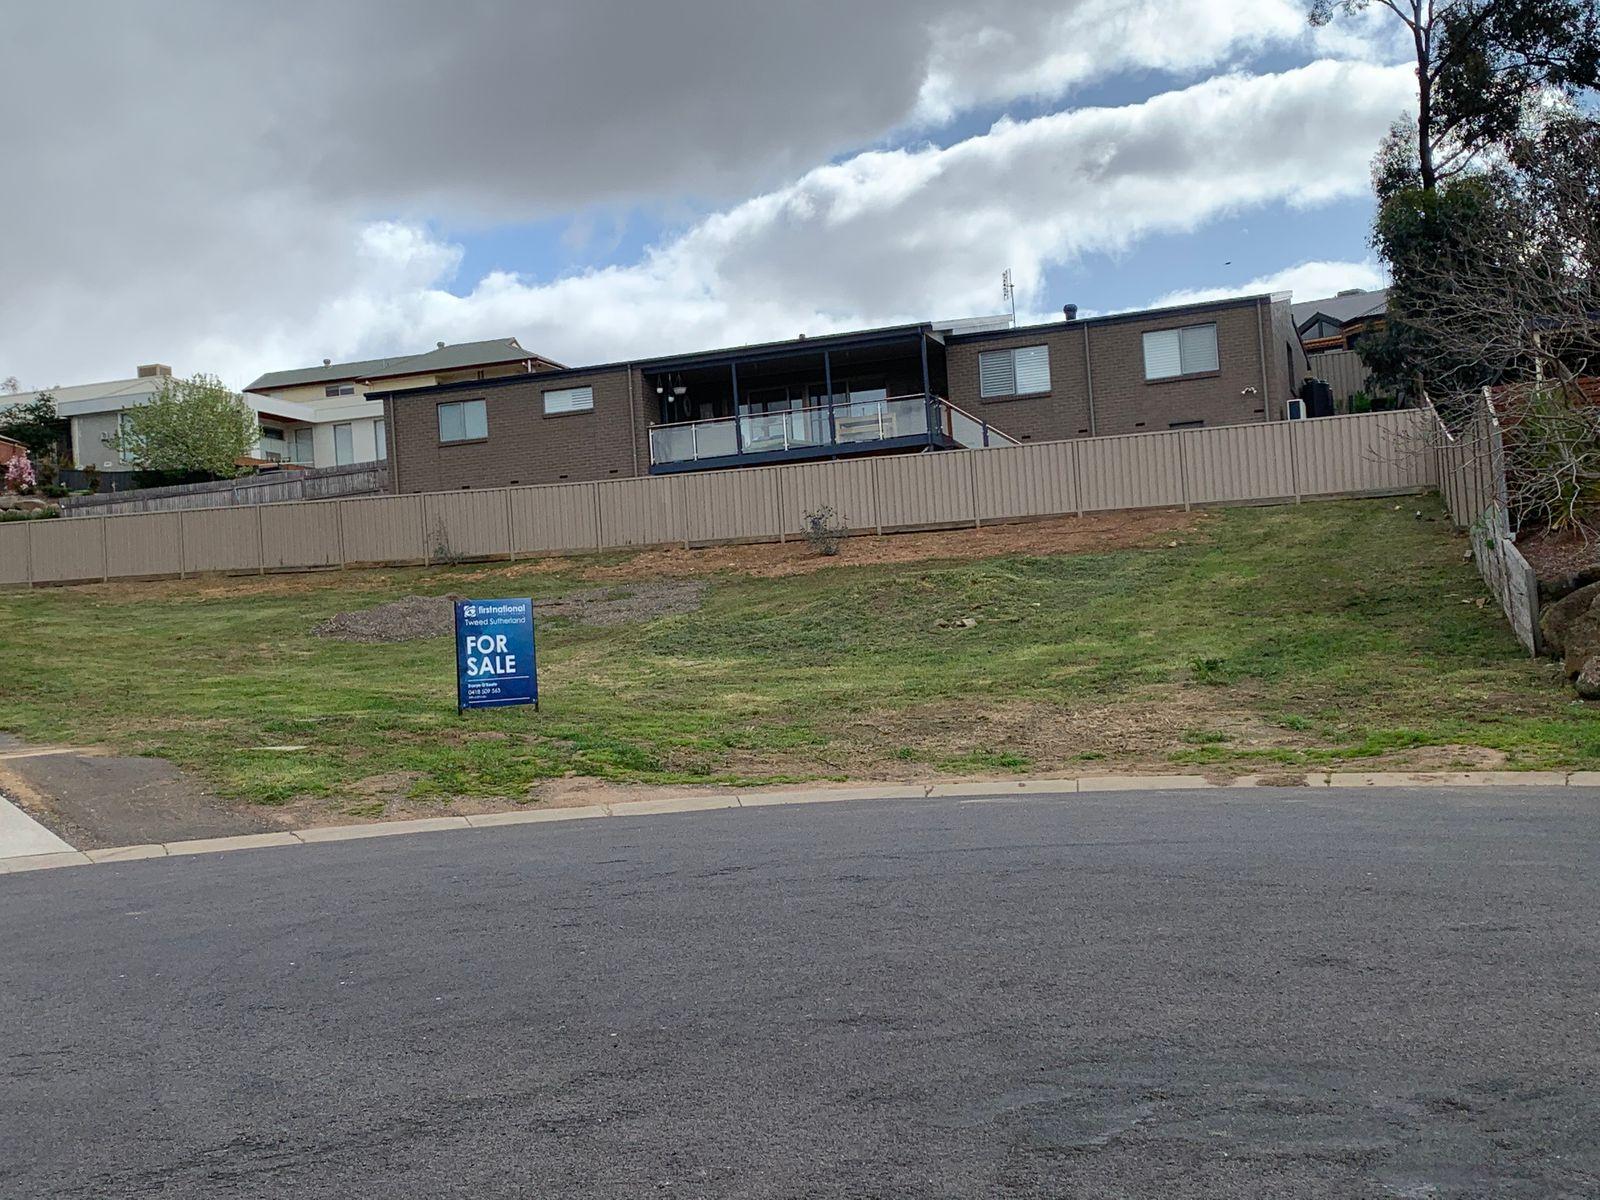 Lot 1/11 Paperbark Court, Strathdale, VIC 3550